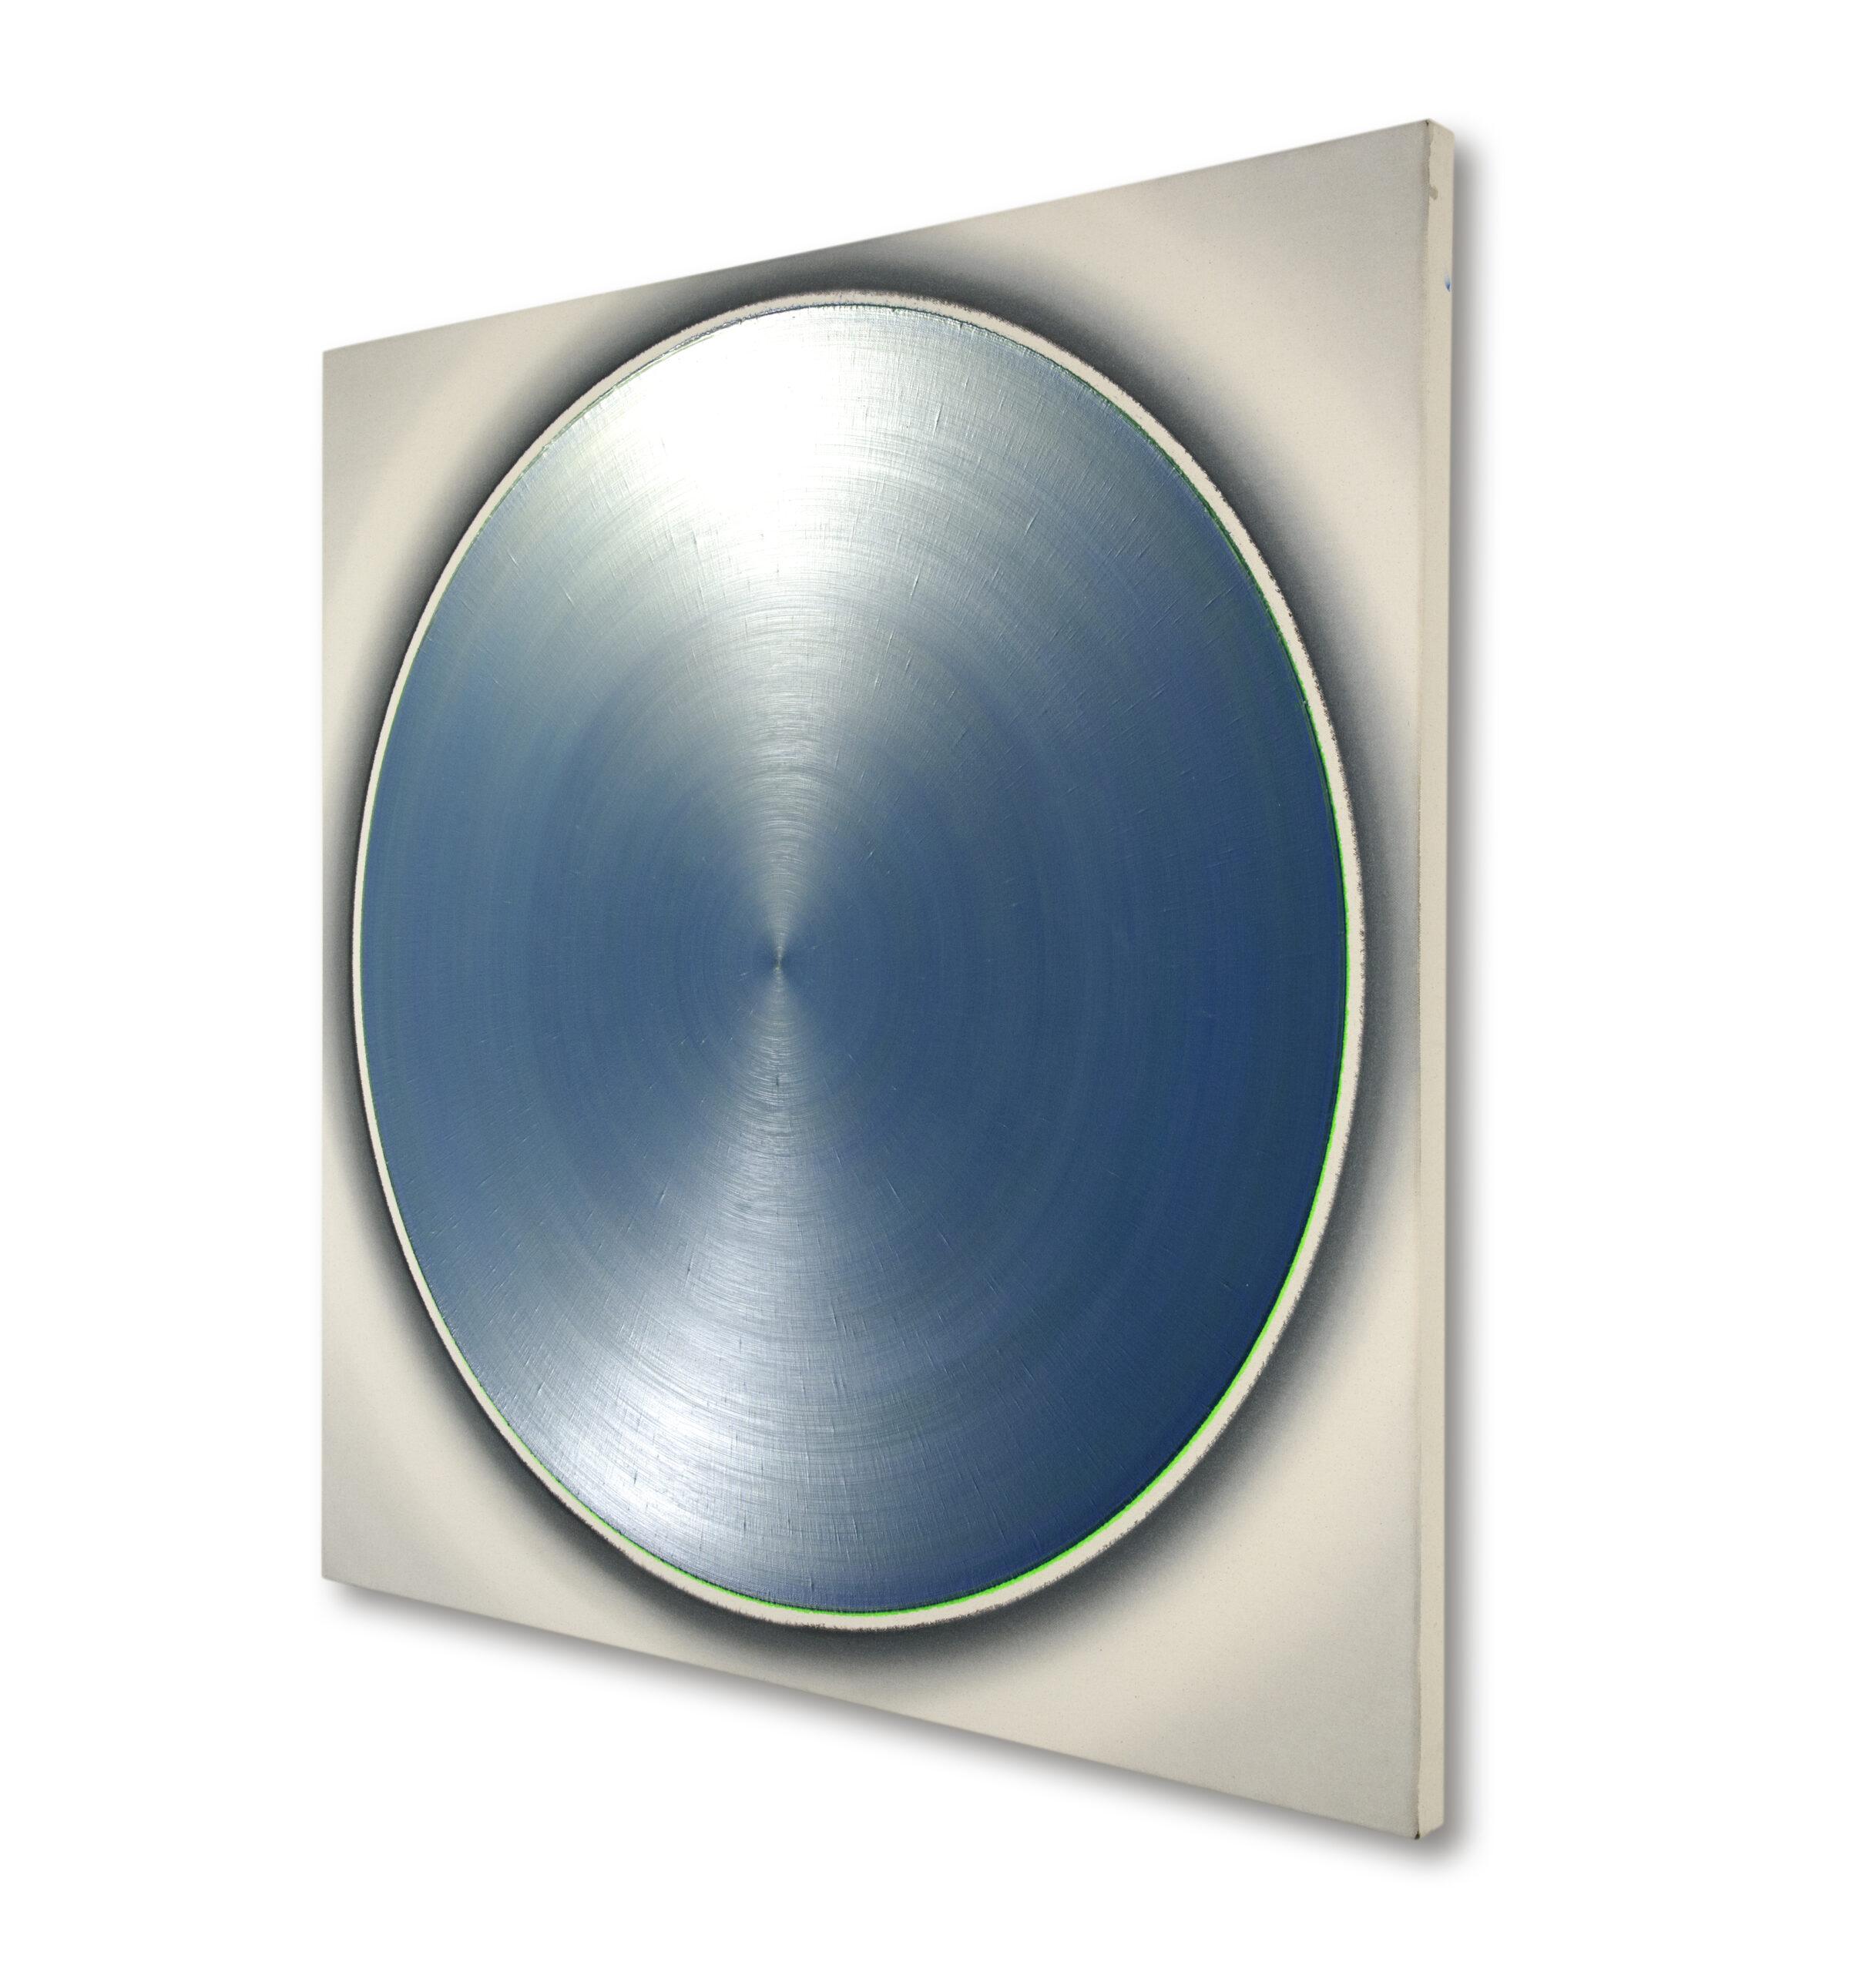 ZF Pale Silver Red Dance With Soft Silver Blue Green, 2011, teilpolarisiert, Acryl auf Leinwand, 130 x 130 cm, rechts